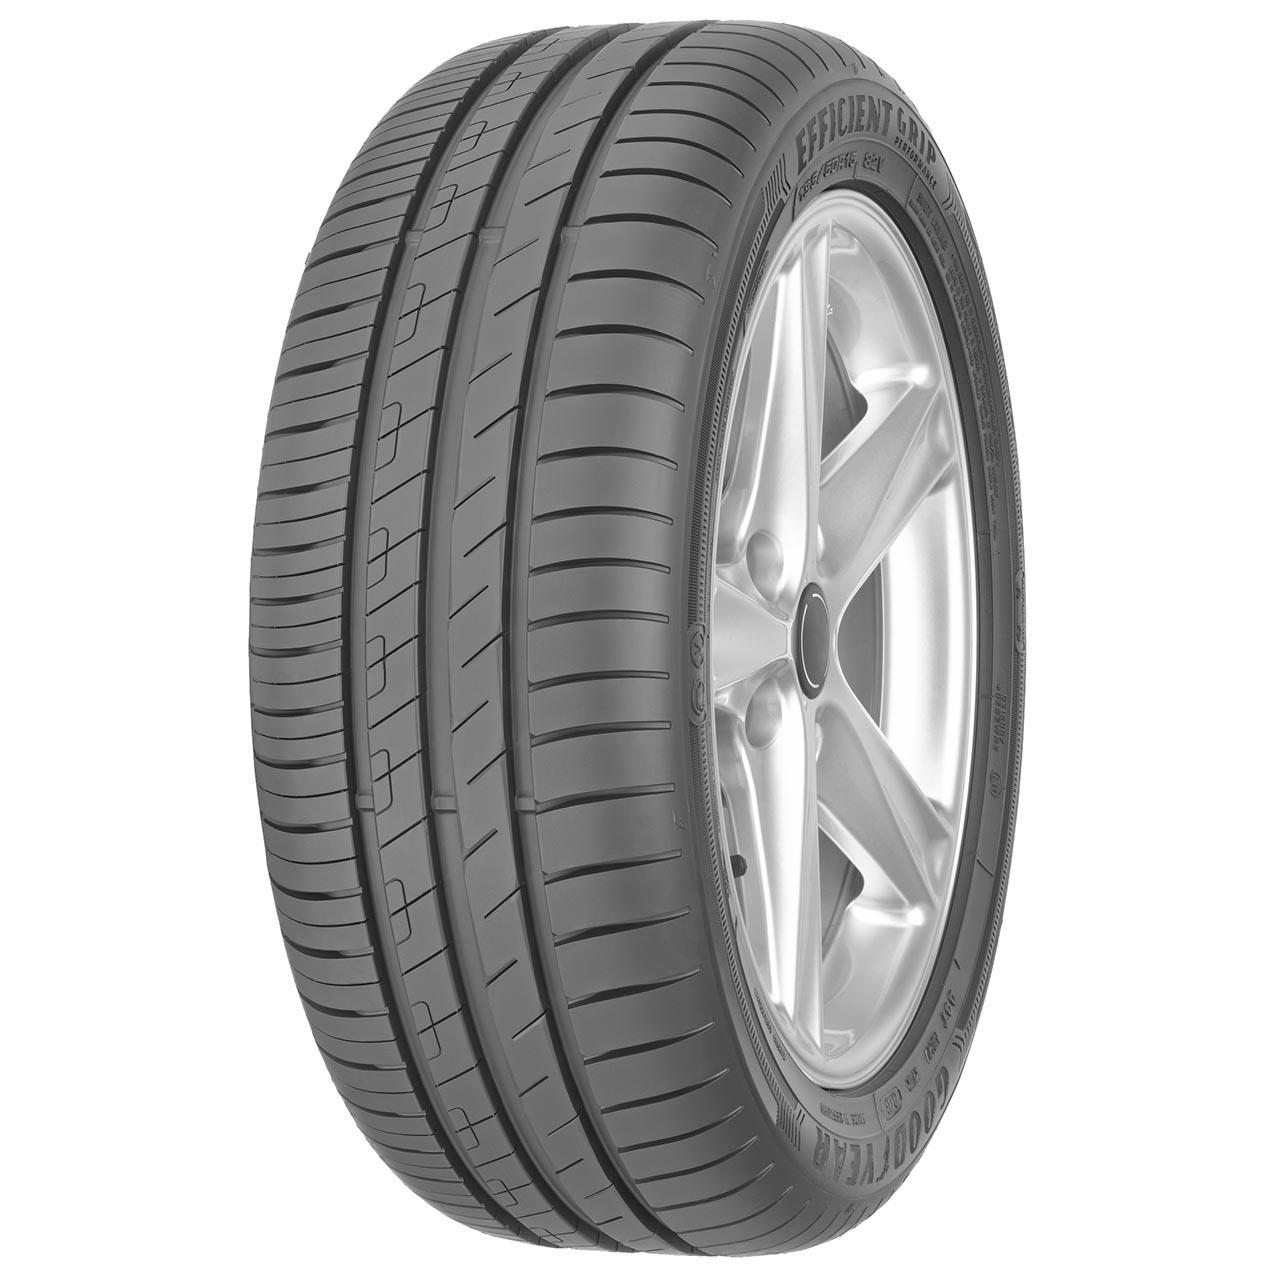 Goodyear Efficientgrip Performance 195/55R16 91V XL AO